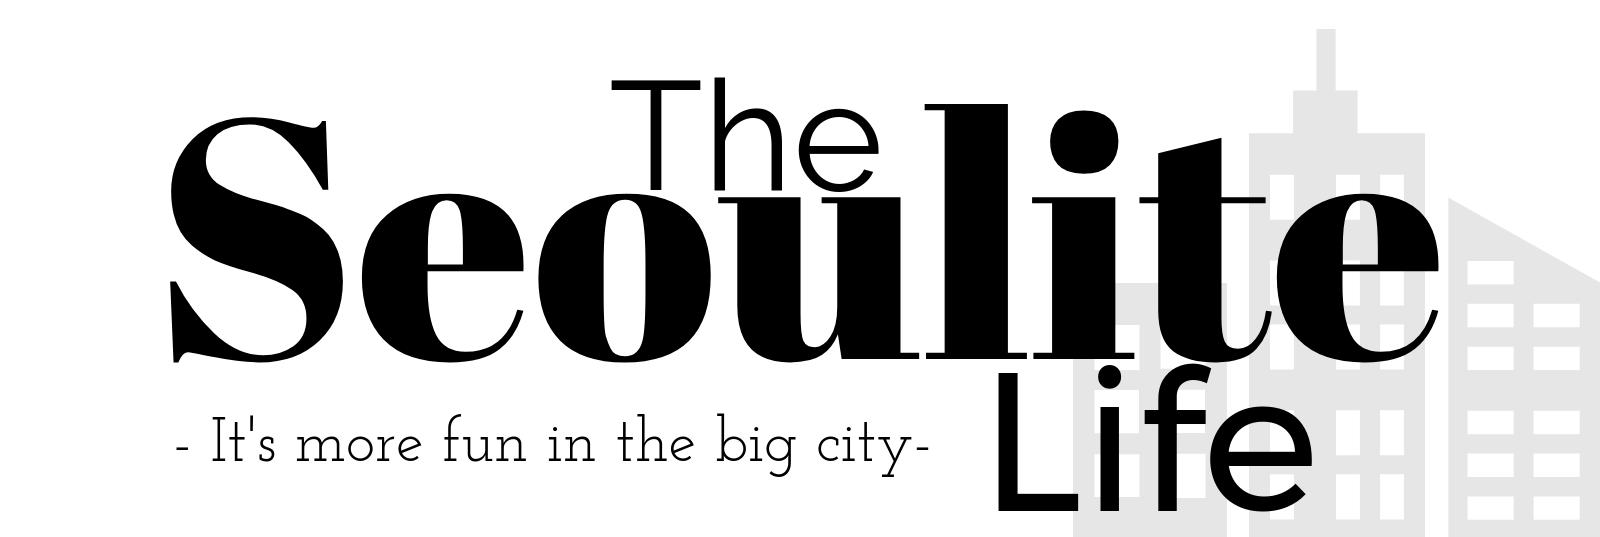 The Seoulite Life